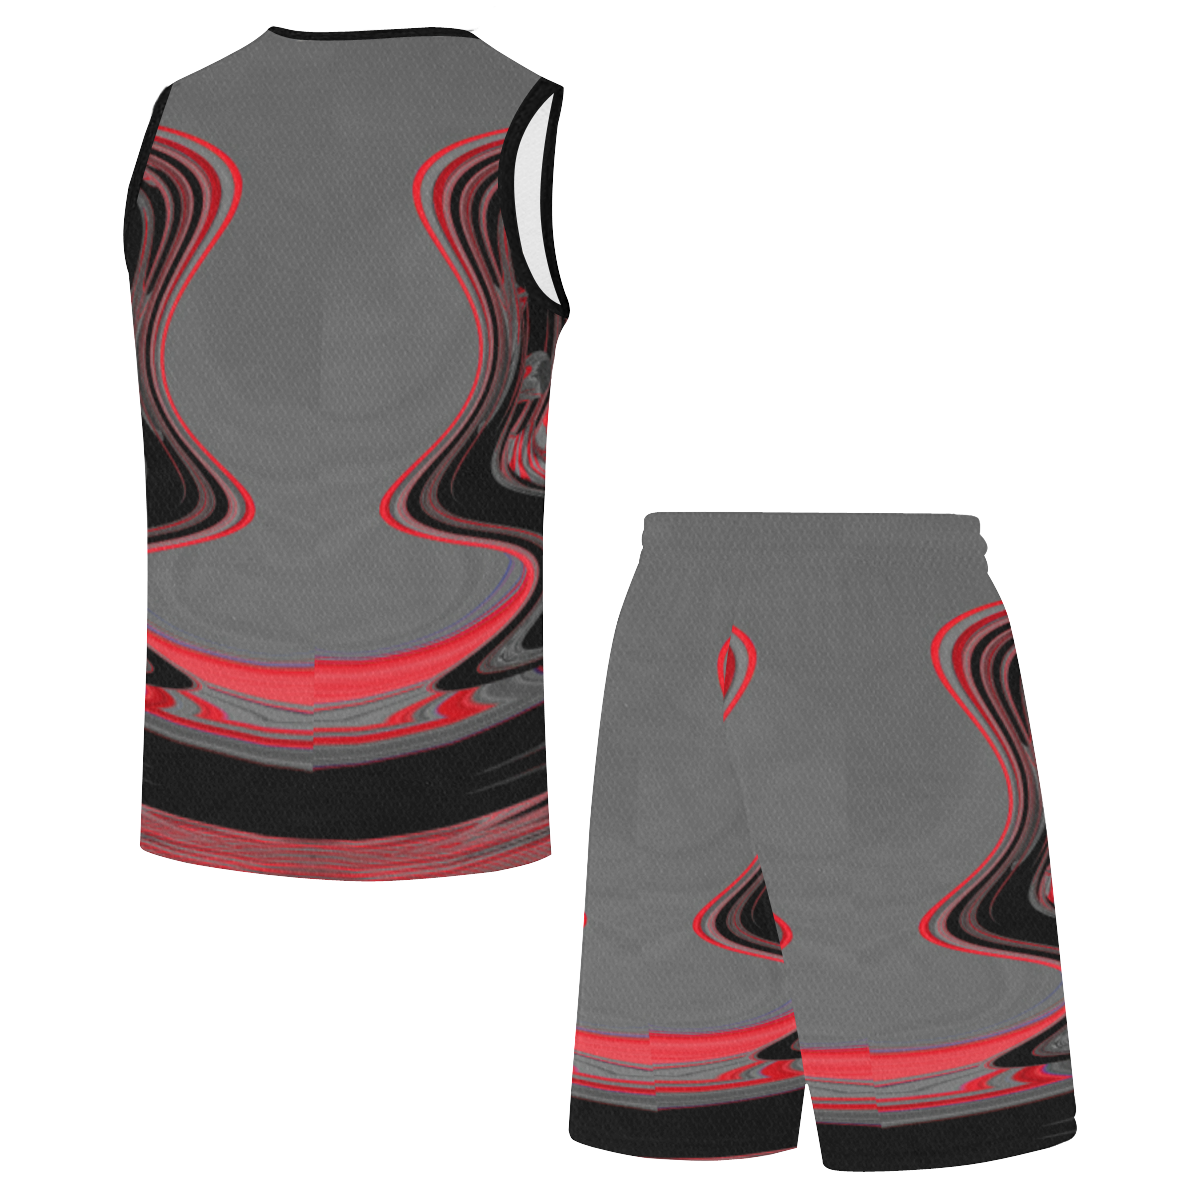 32_5000 13 All Over Print Basketball Uniform